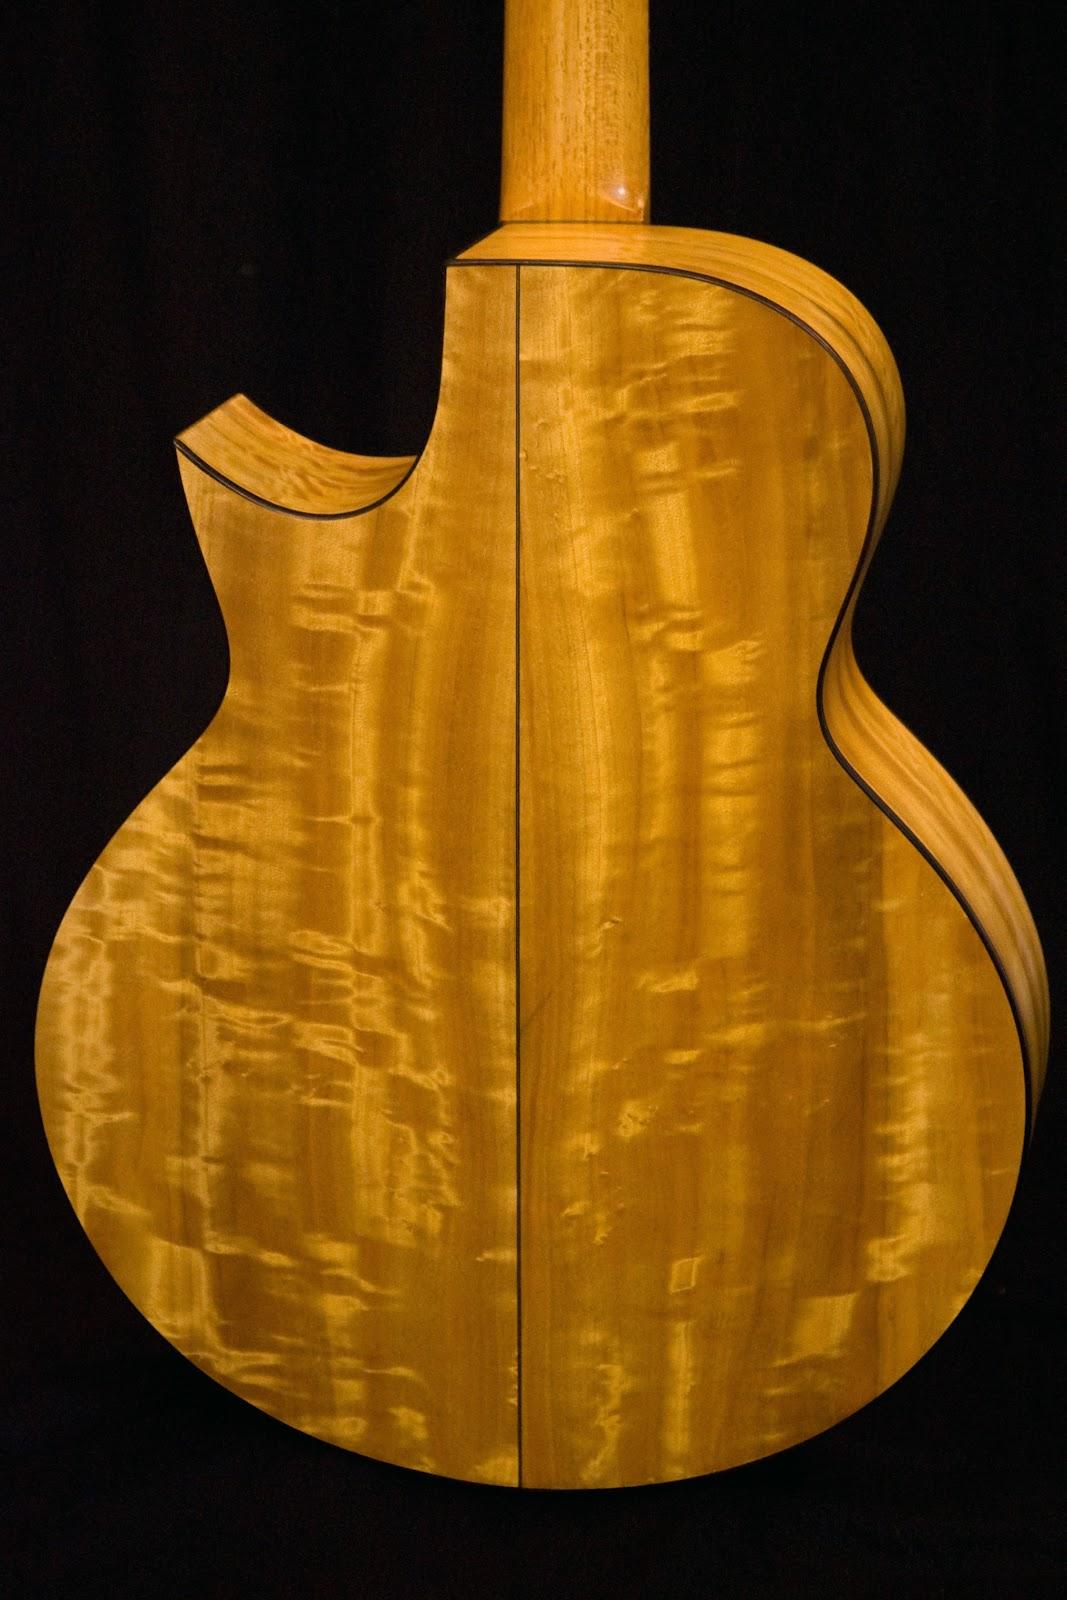 http://1.bp.blogspot.com/-W9kHpCP51wo/S6pFFLzfmmI/AAAAAAAAp-4/eGWu3DzjZCA/s1600/Five+string+electro+acoustic+bass%252C+rear+view%252C+shellac+finishing.JPG